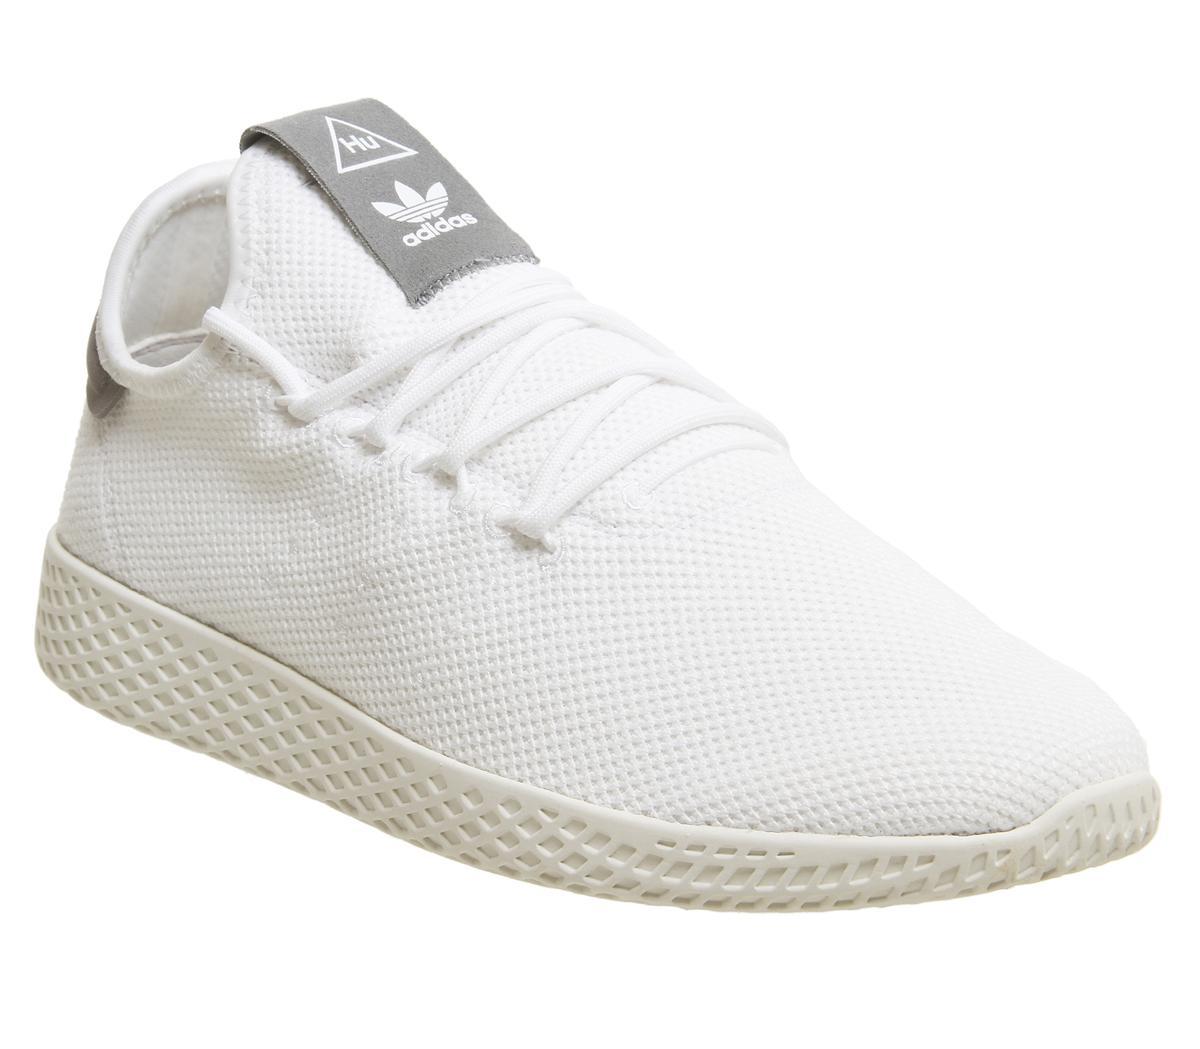 adidas Pw Tennis Trainers White Grey